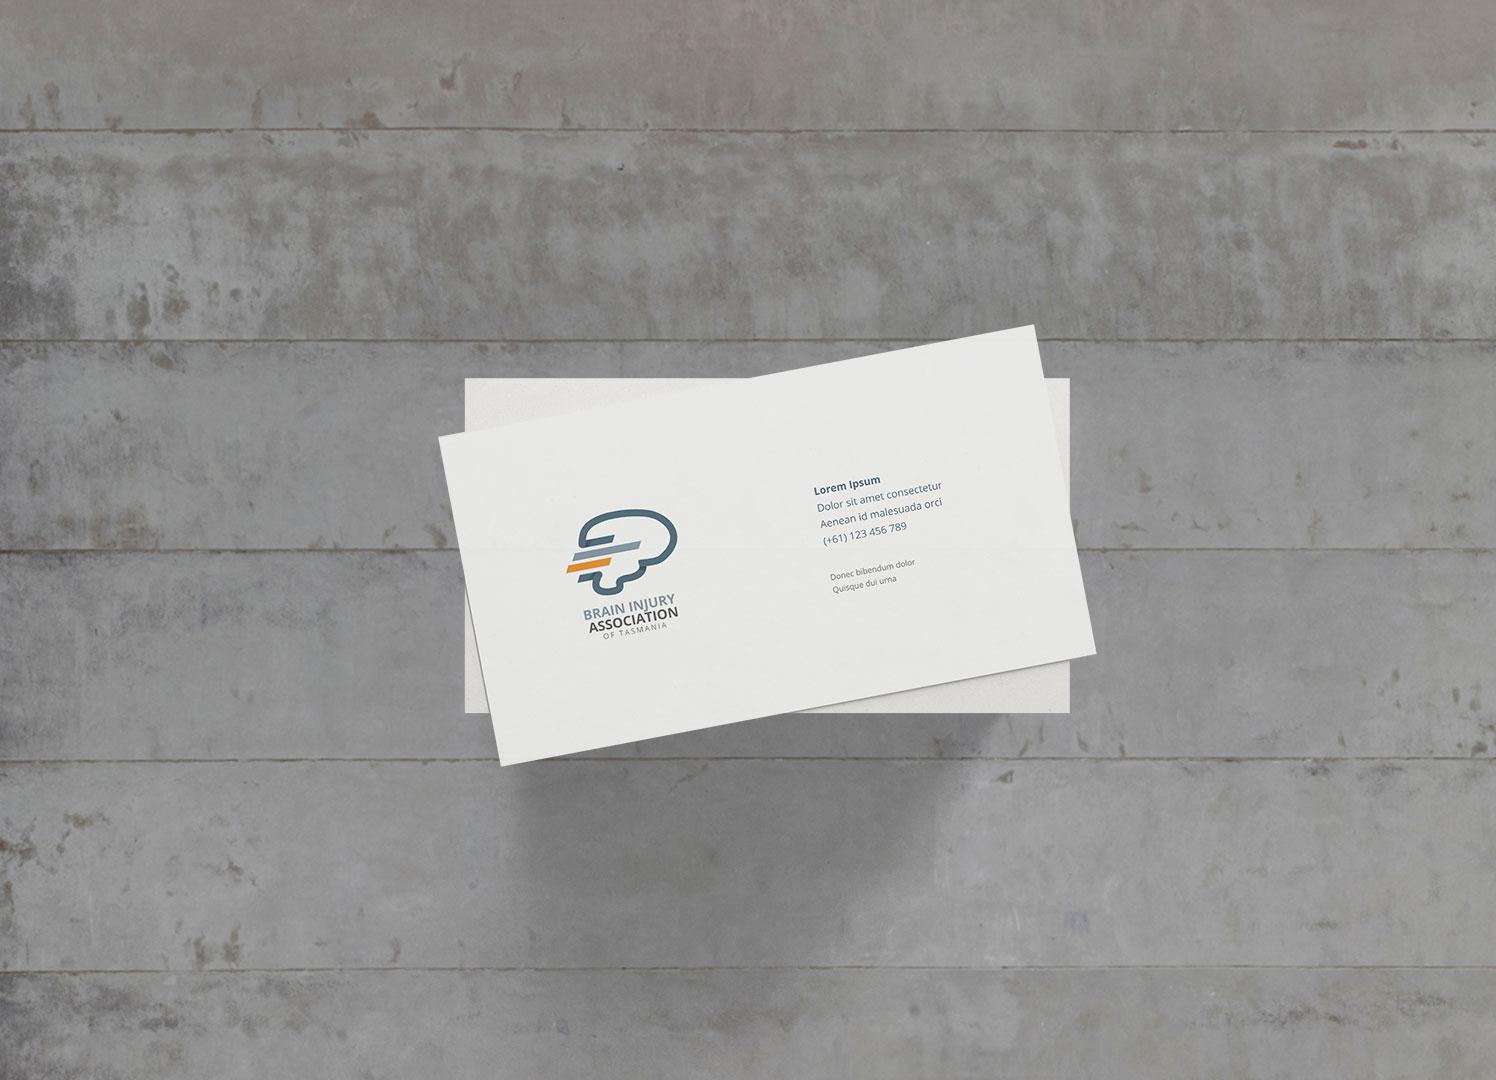 biat logo shown on business cards